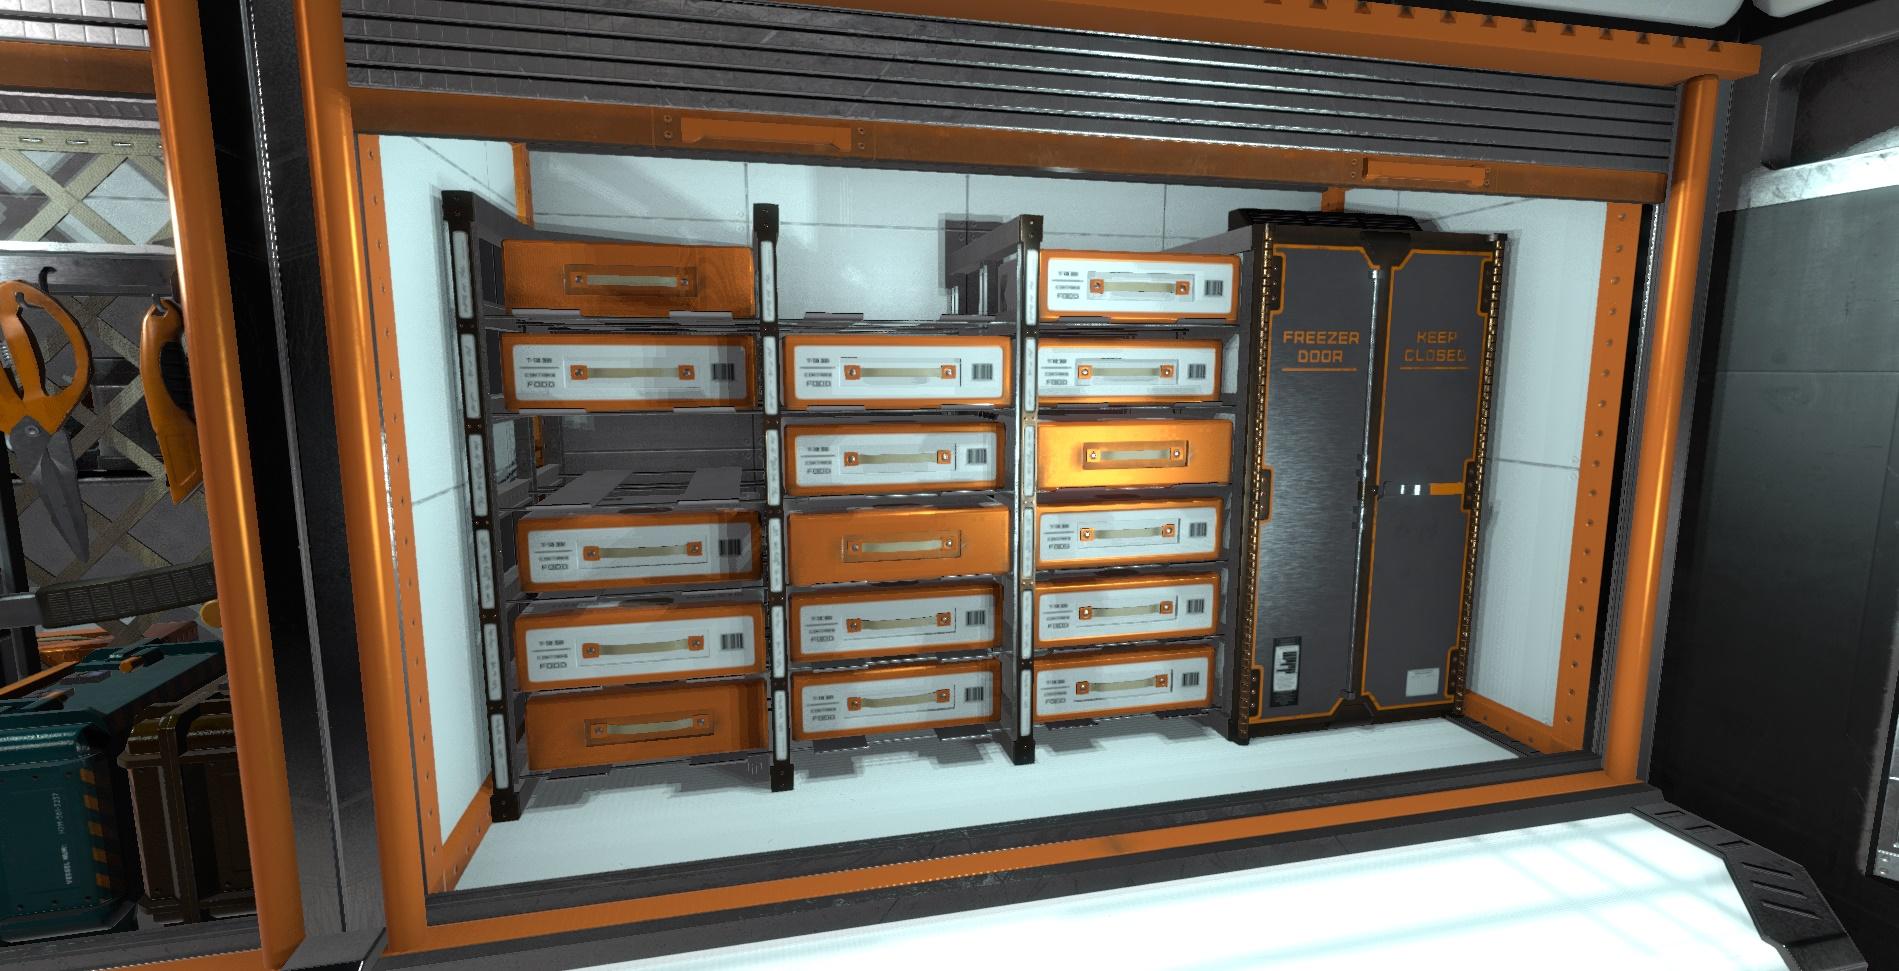 StorageUnit_Consume01.jpg